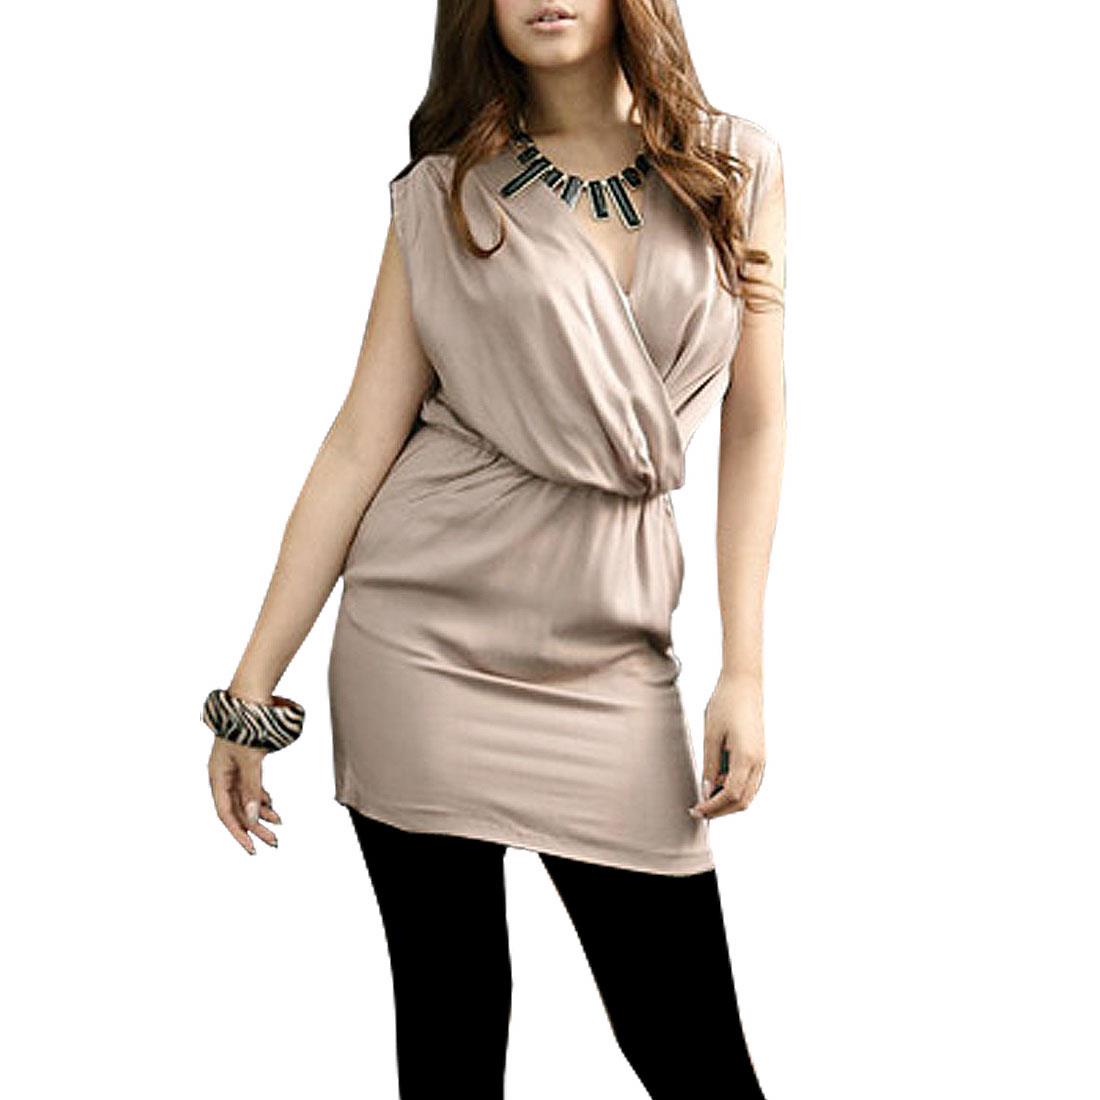 Ladies Crossover V Neck Sleeveless Above Knee Mini Dress Khaki XS